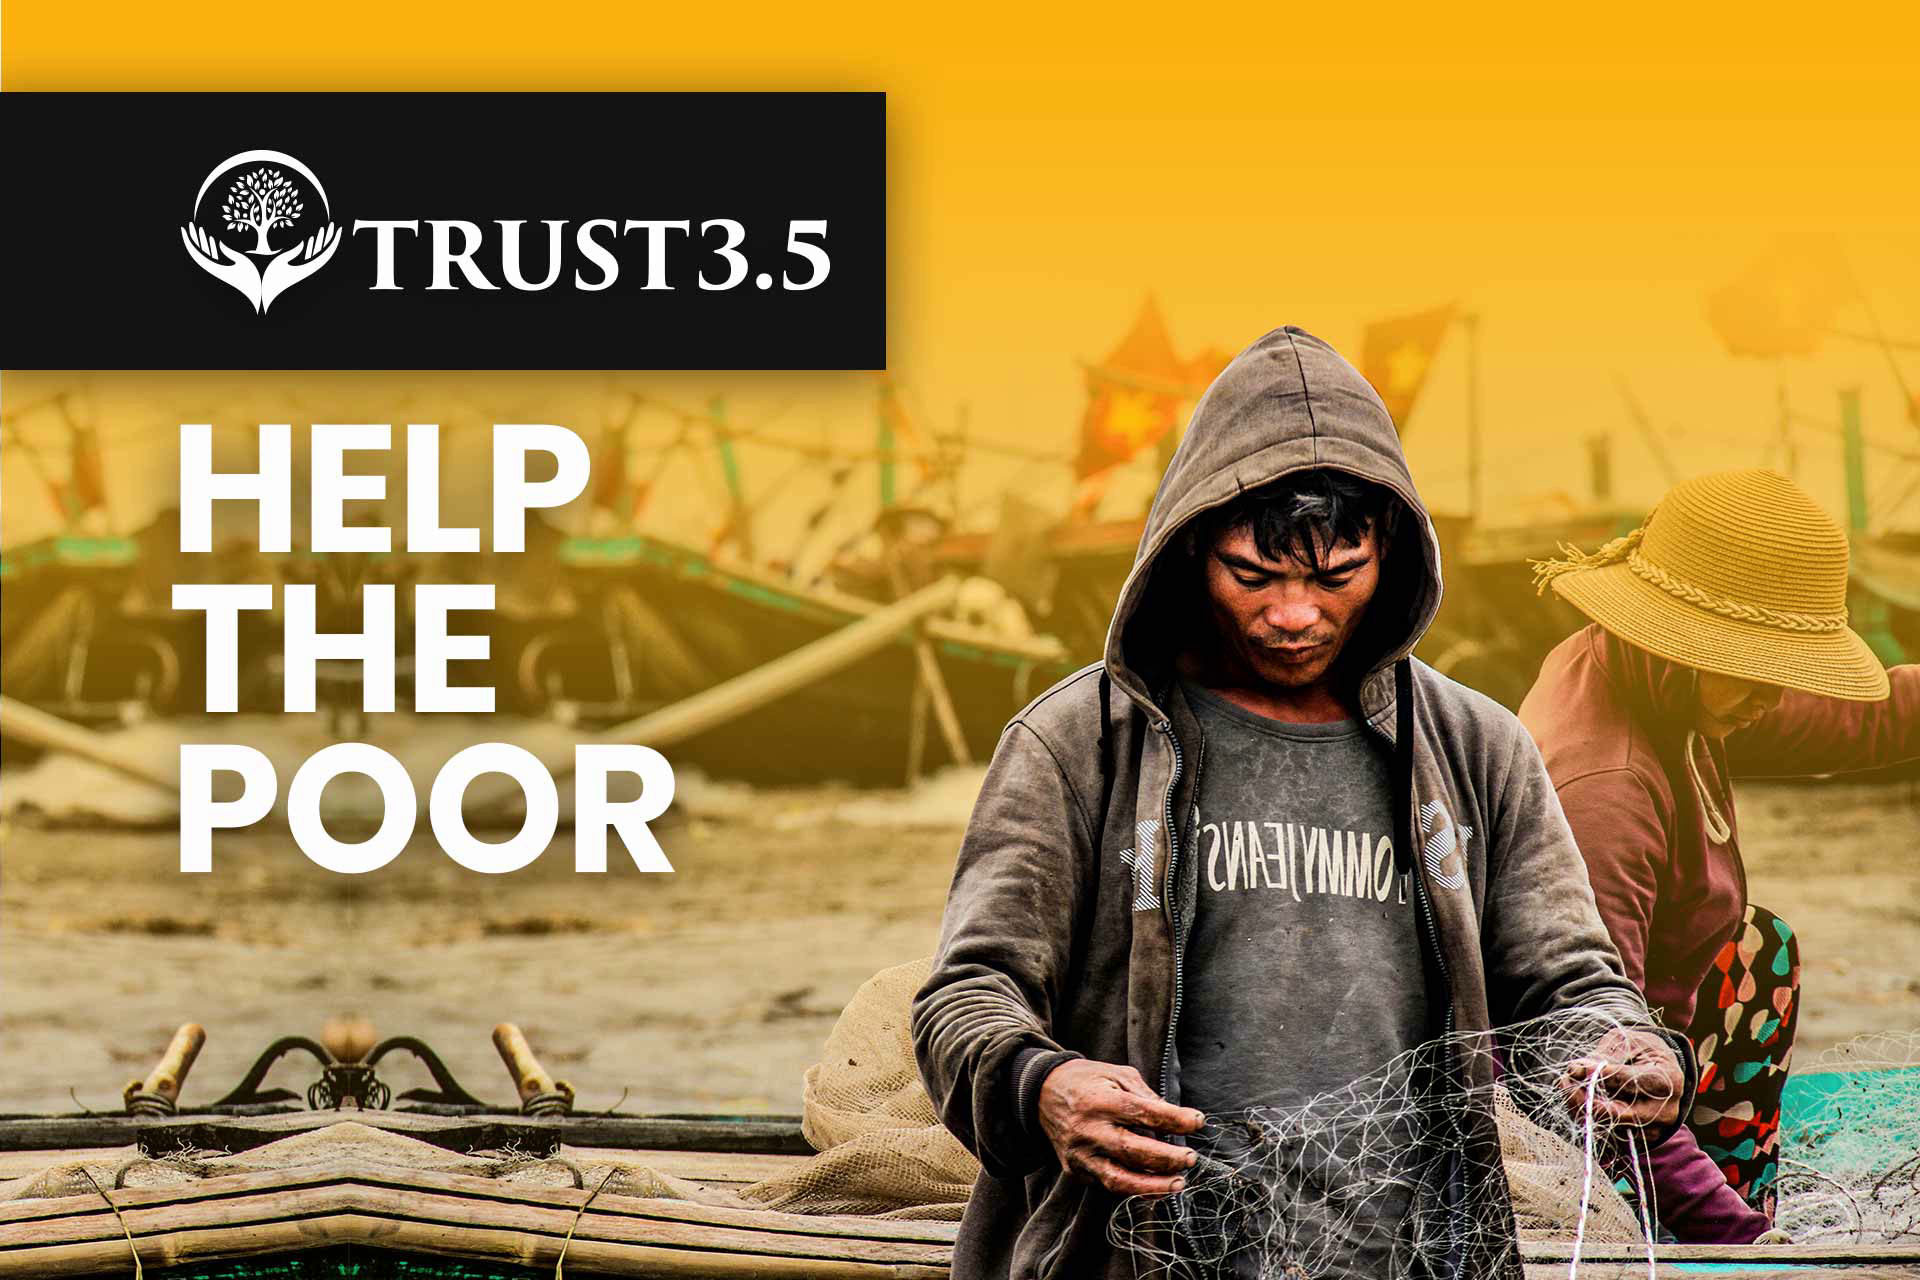 Website design & development. Yellow & White template. Poor kid image. Christian Charity Institute